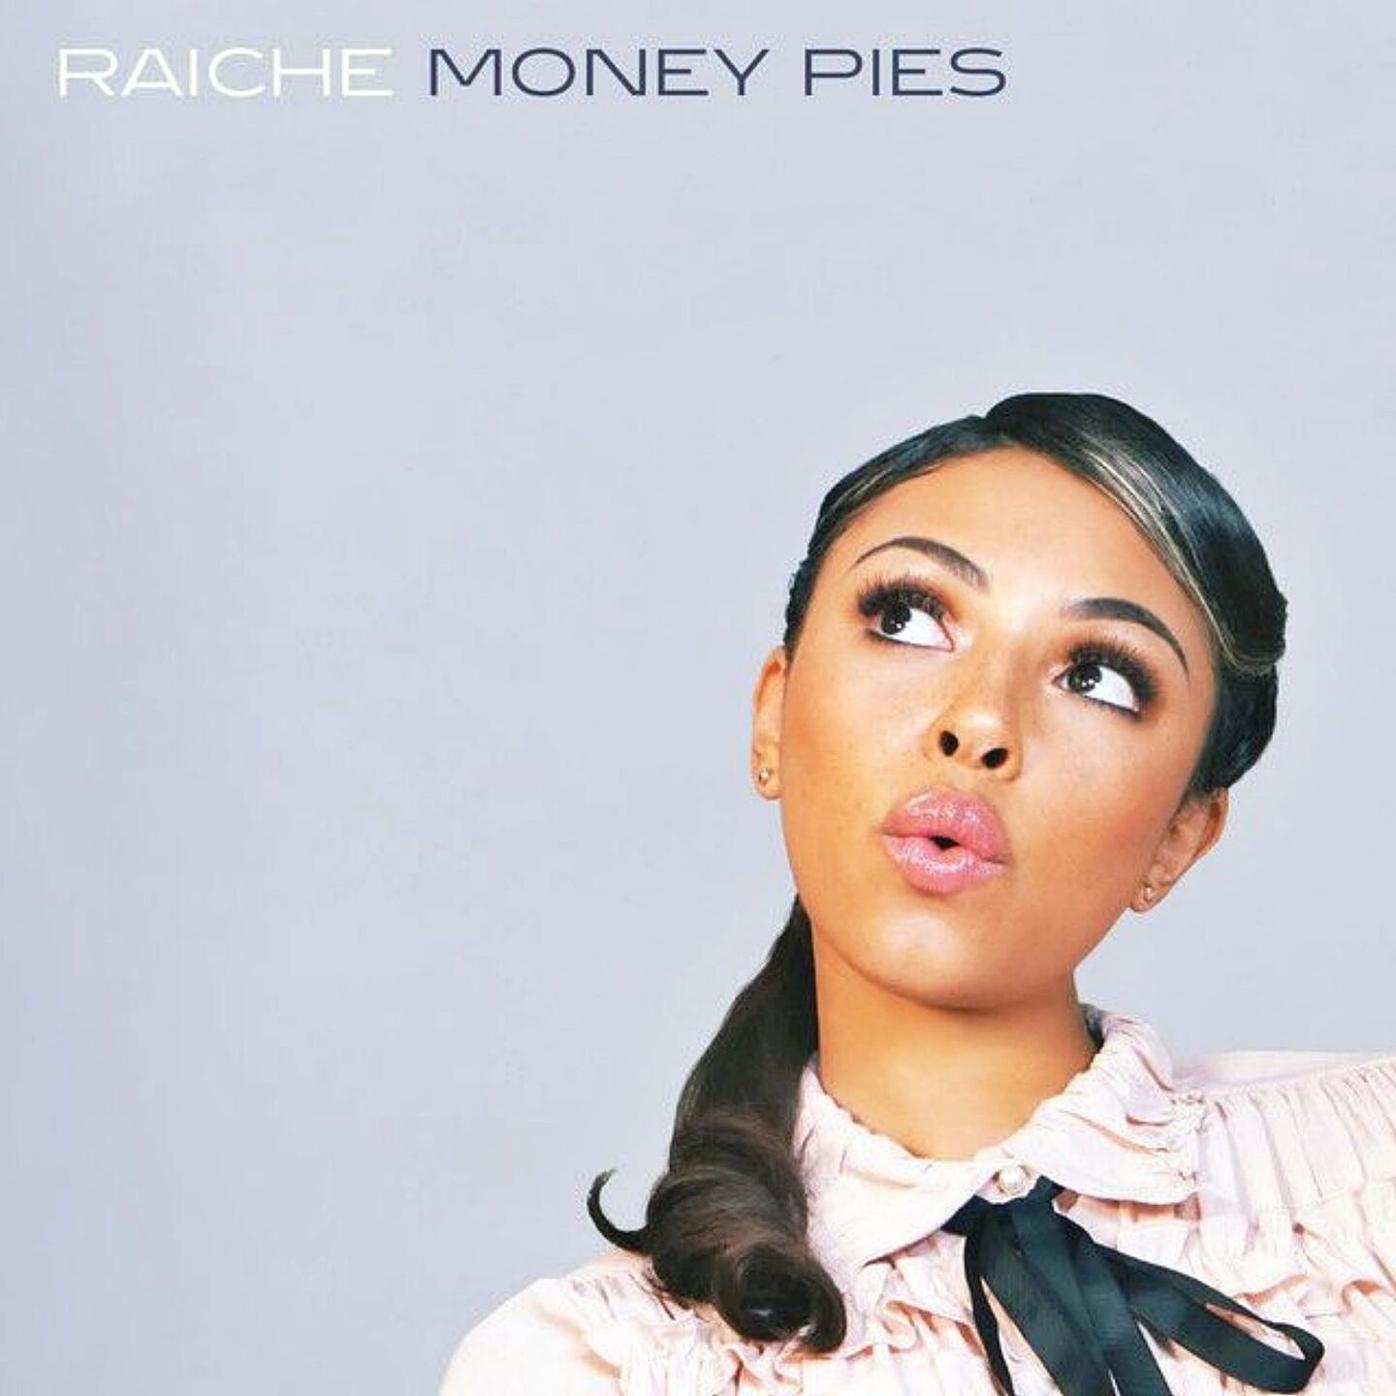 When will Raiche feel successful? 'When the whole world knows my name'